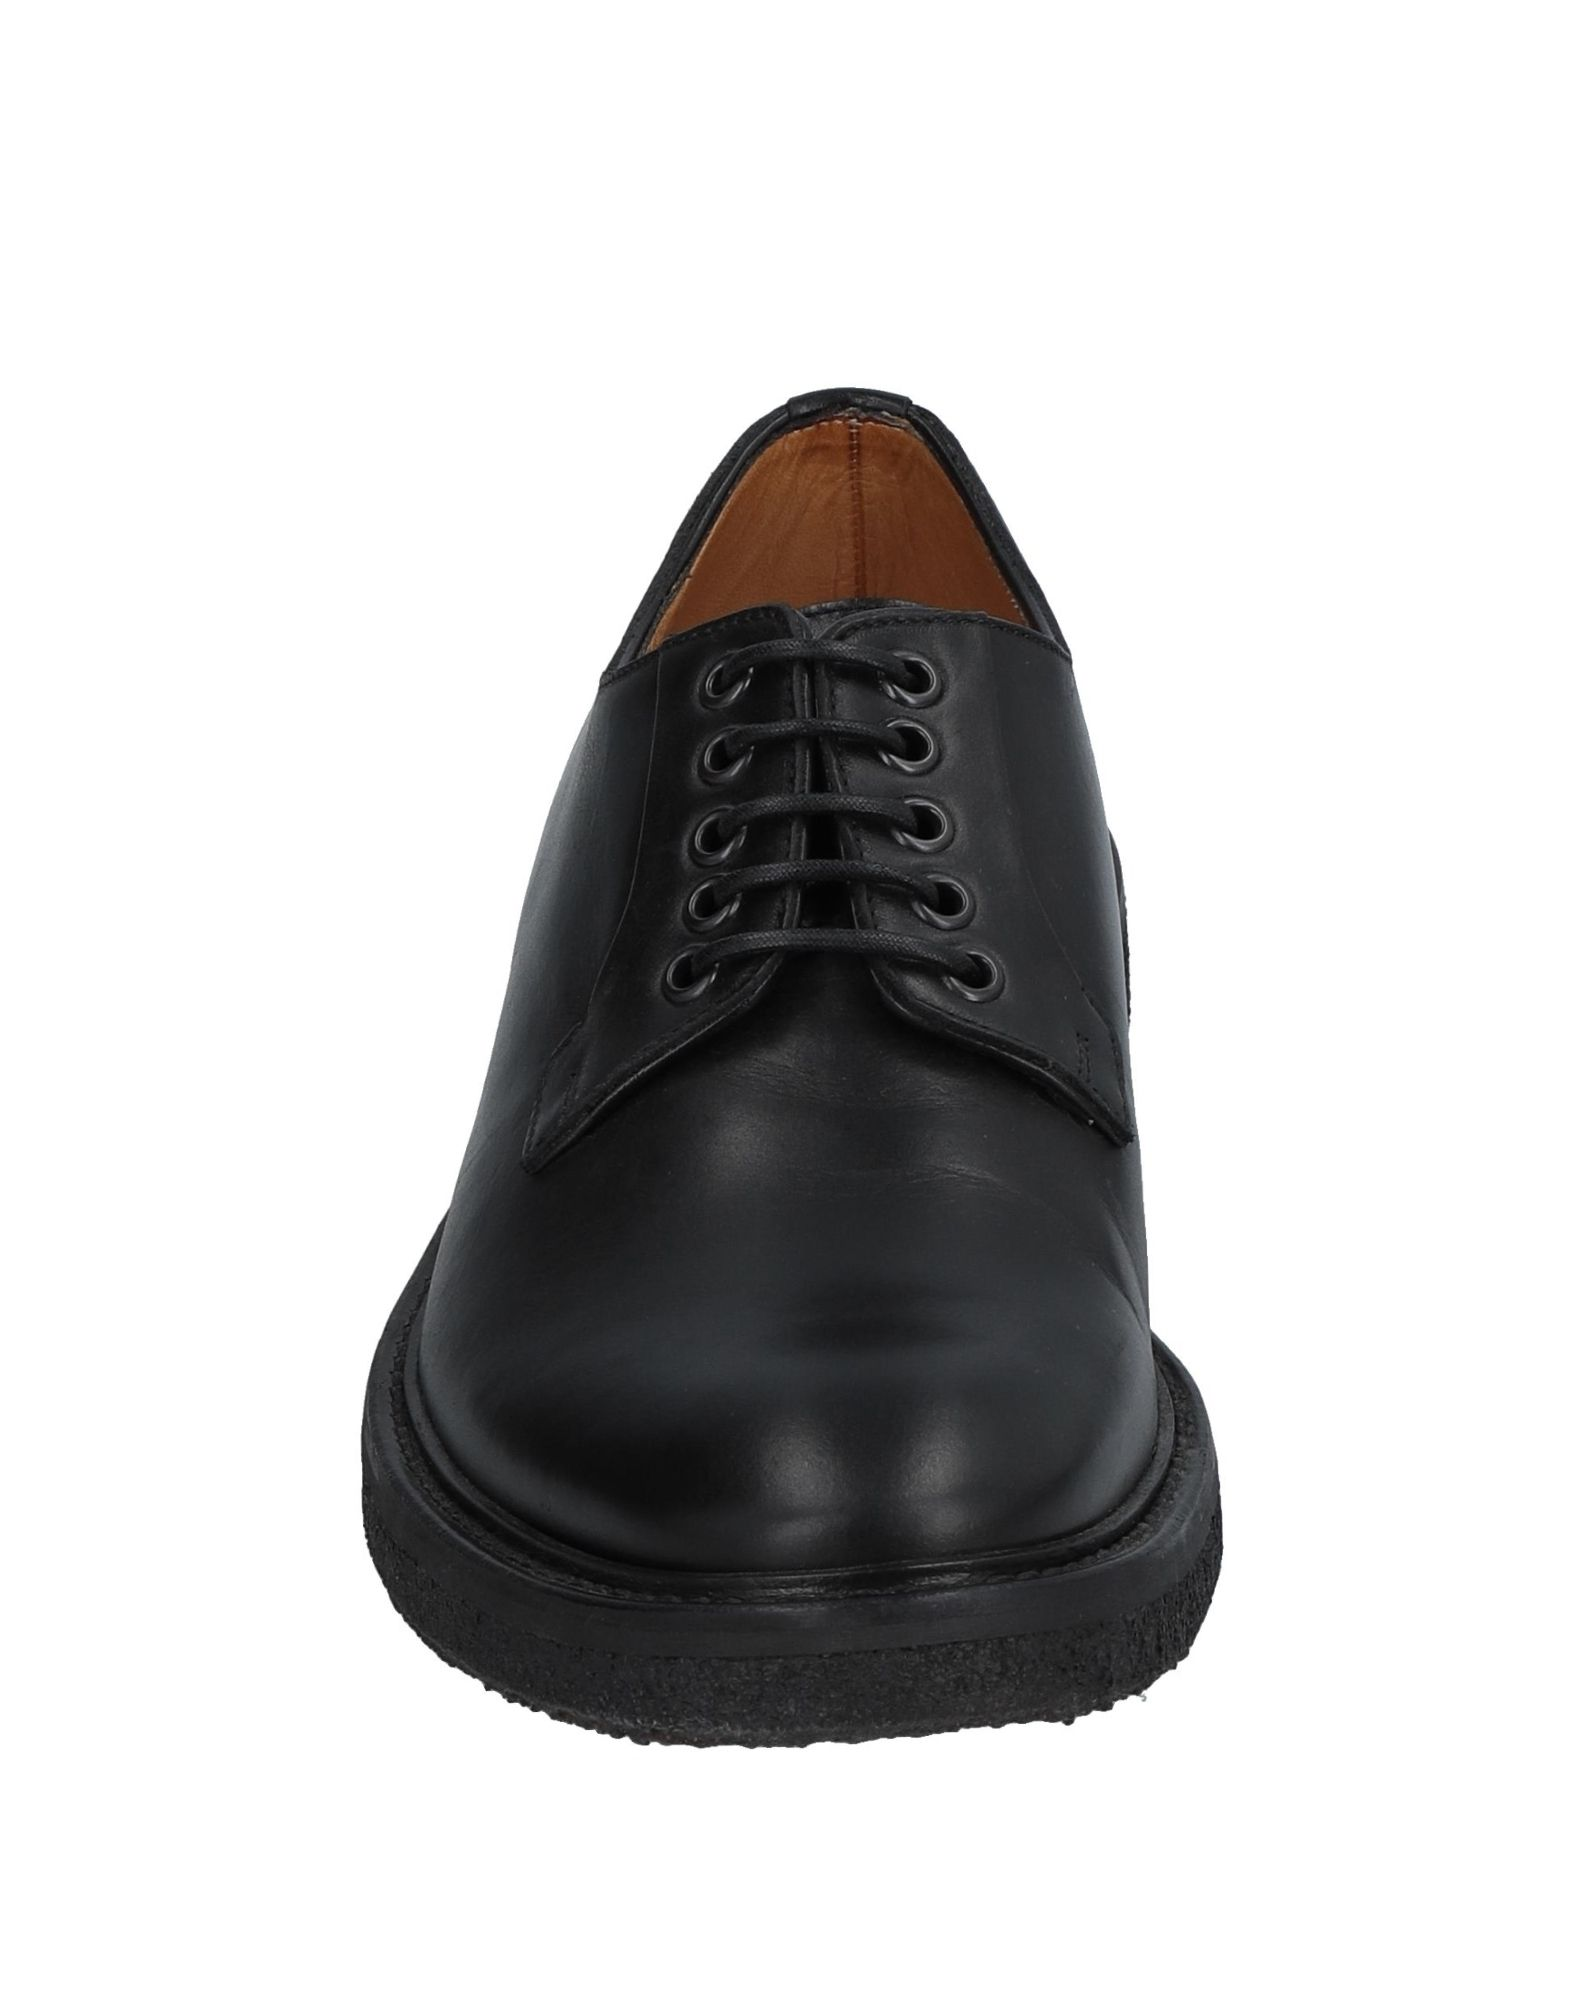 ... Rabatt echte Schnürschuhe Schuhe Seboy s Schnürschuhe echte Herren  11536355OO e230ff 0b86f7aa64